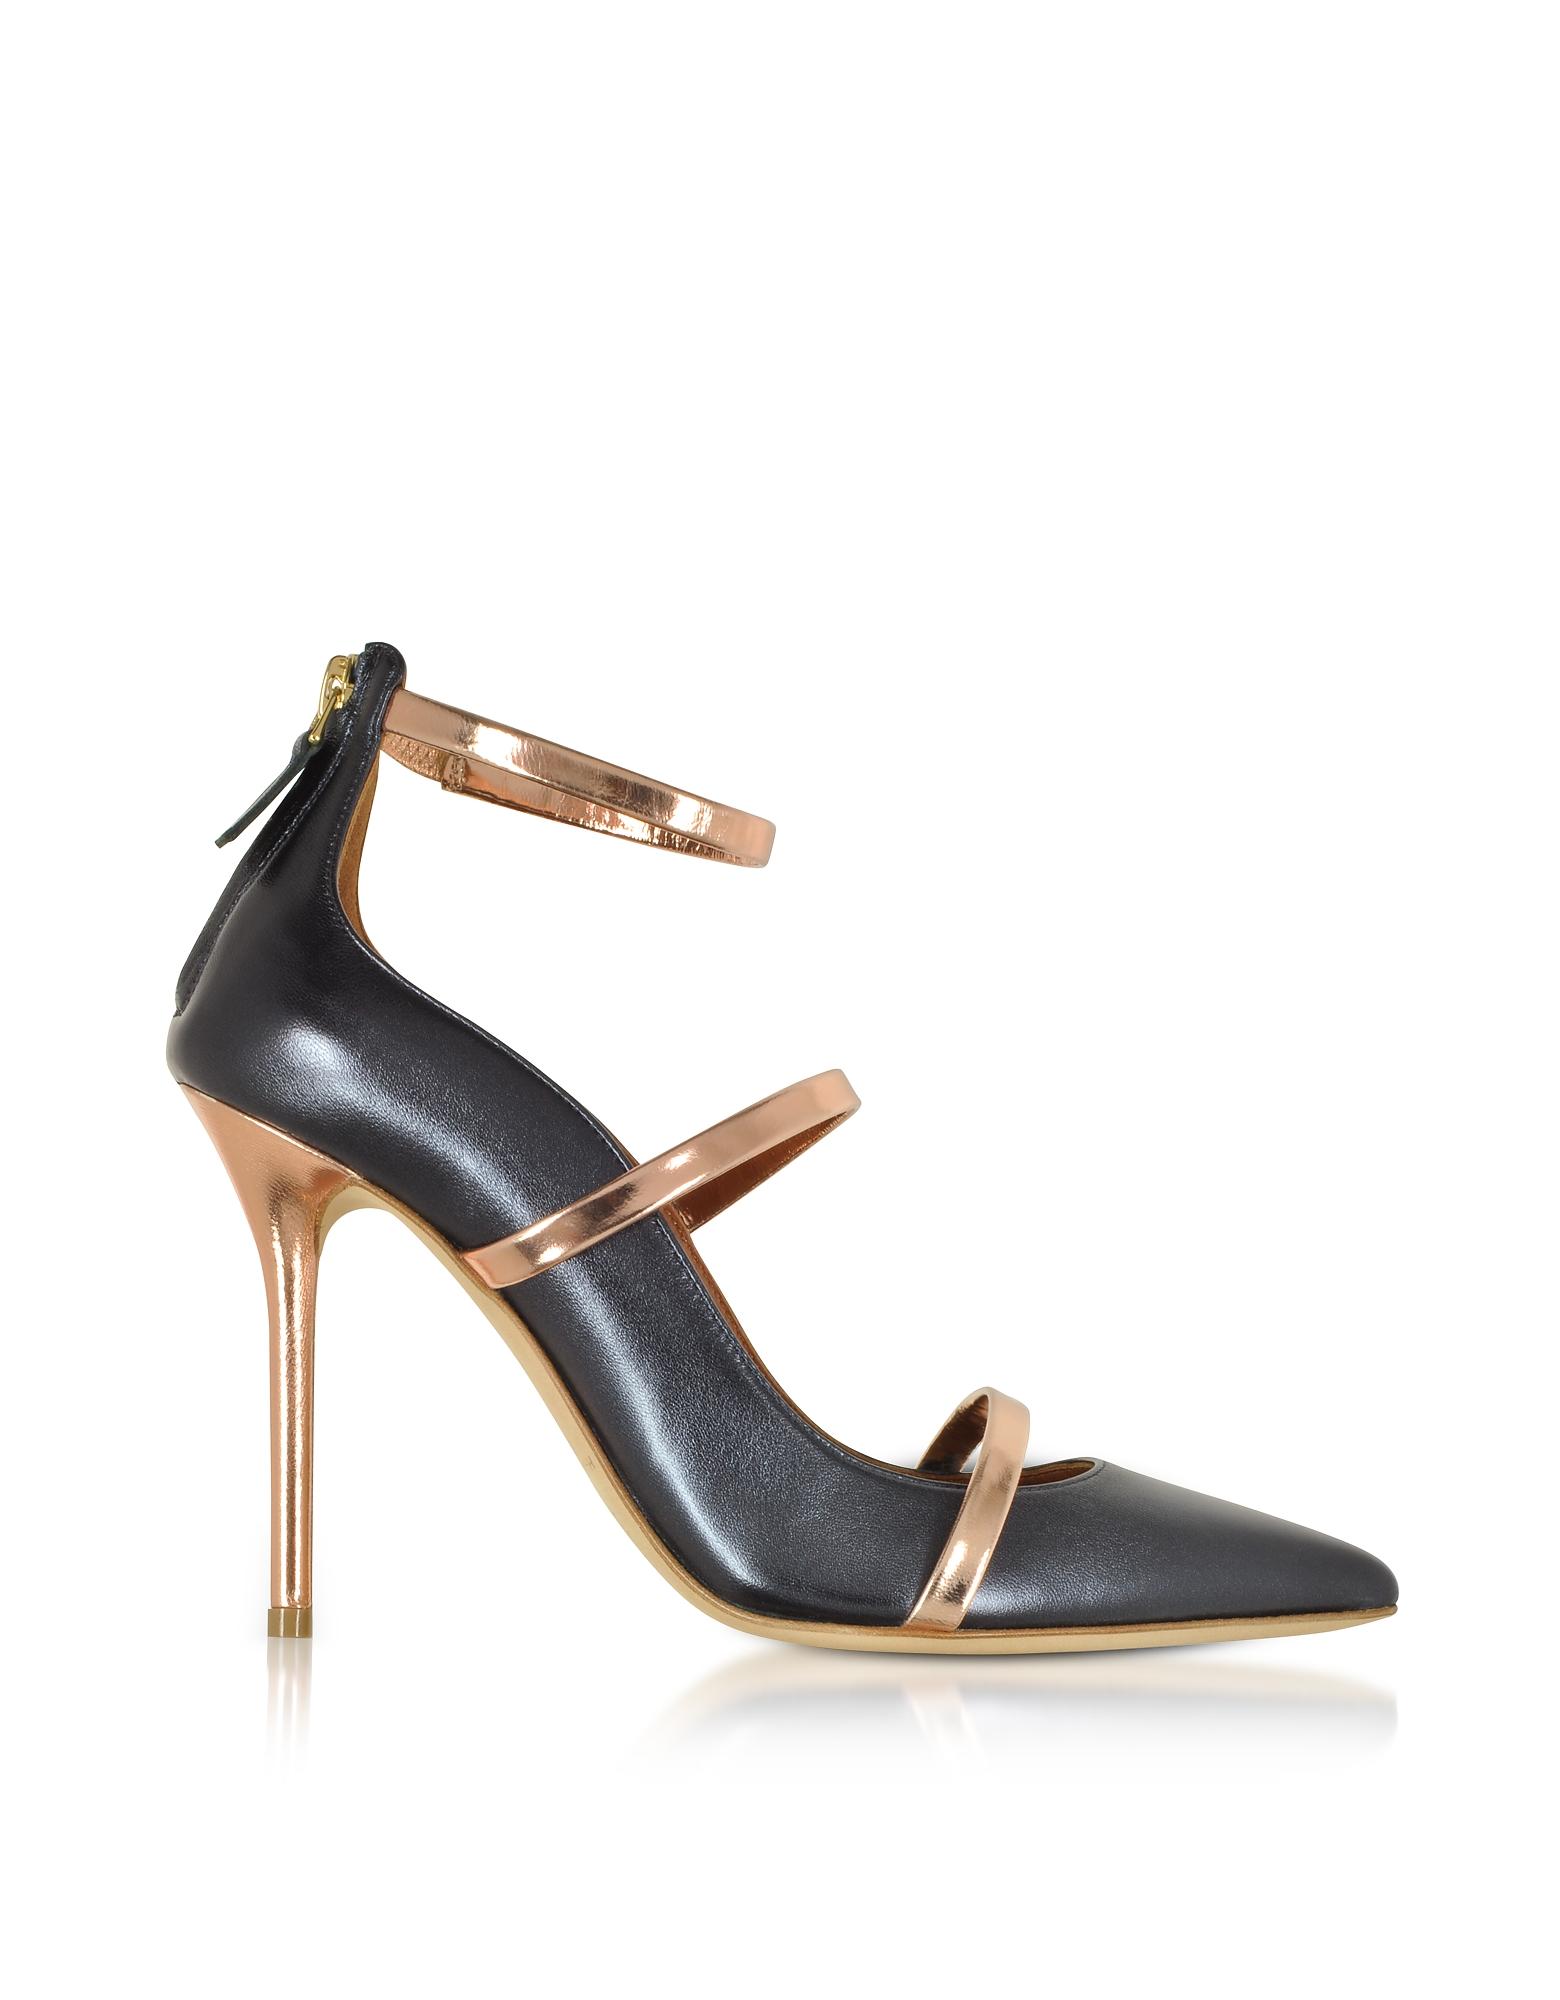 Robyn 100 Midnight Nappa Leather High Heel Pumps